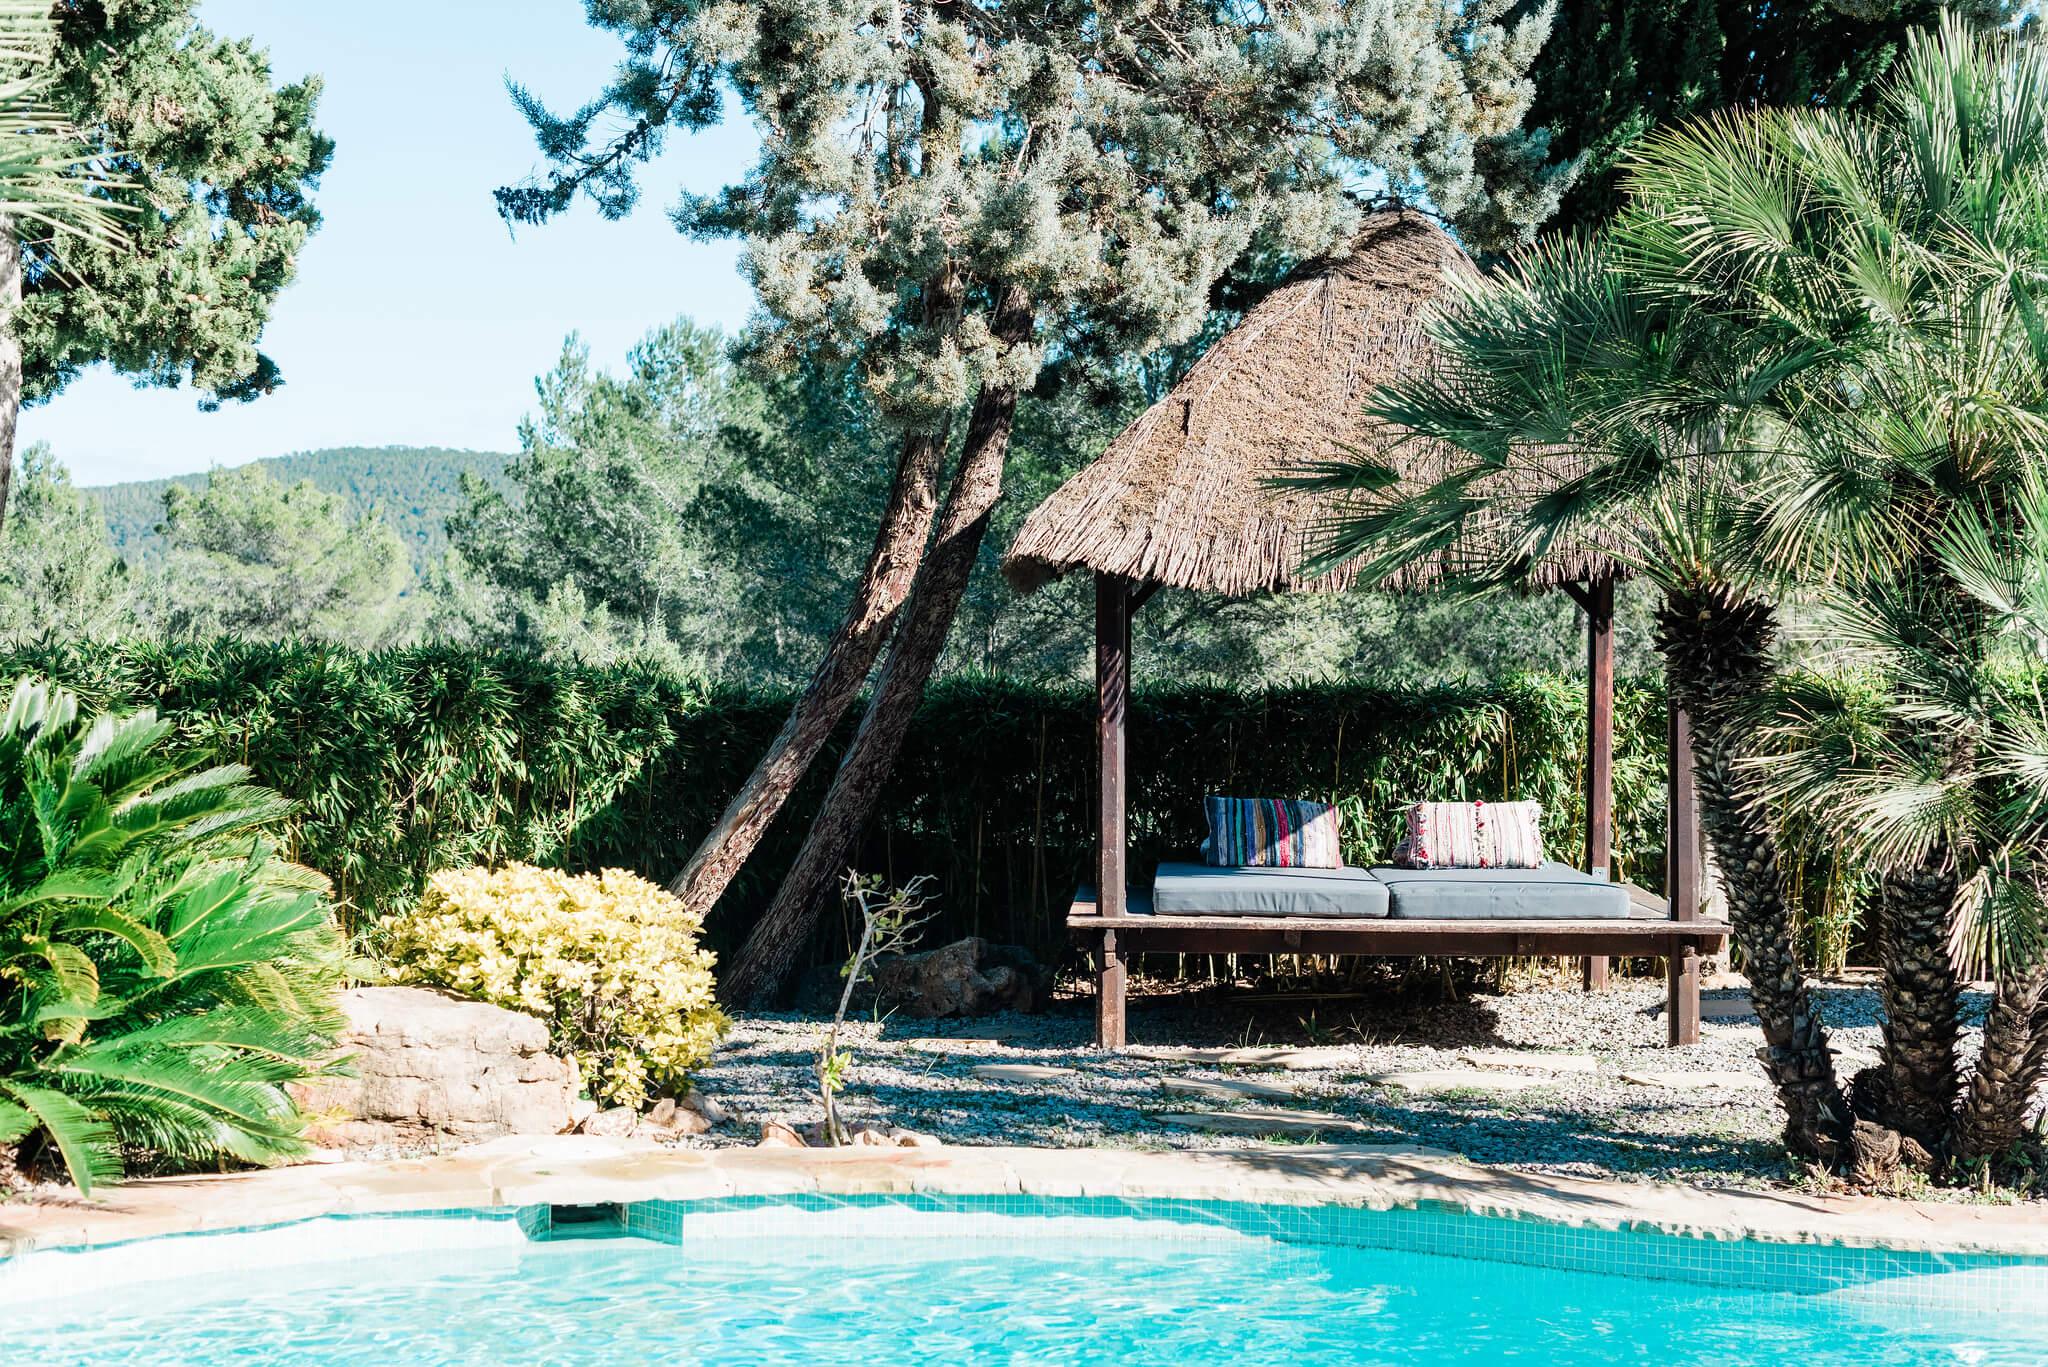 https://www.white-ibiza.com/wp-content/uploads/2020/05/white-ibiza-villas-can-verde-exterior-day-bed2.jpg